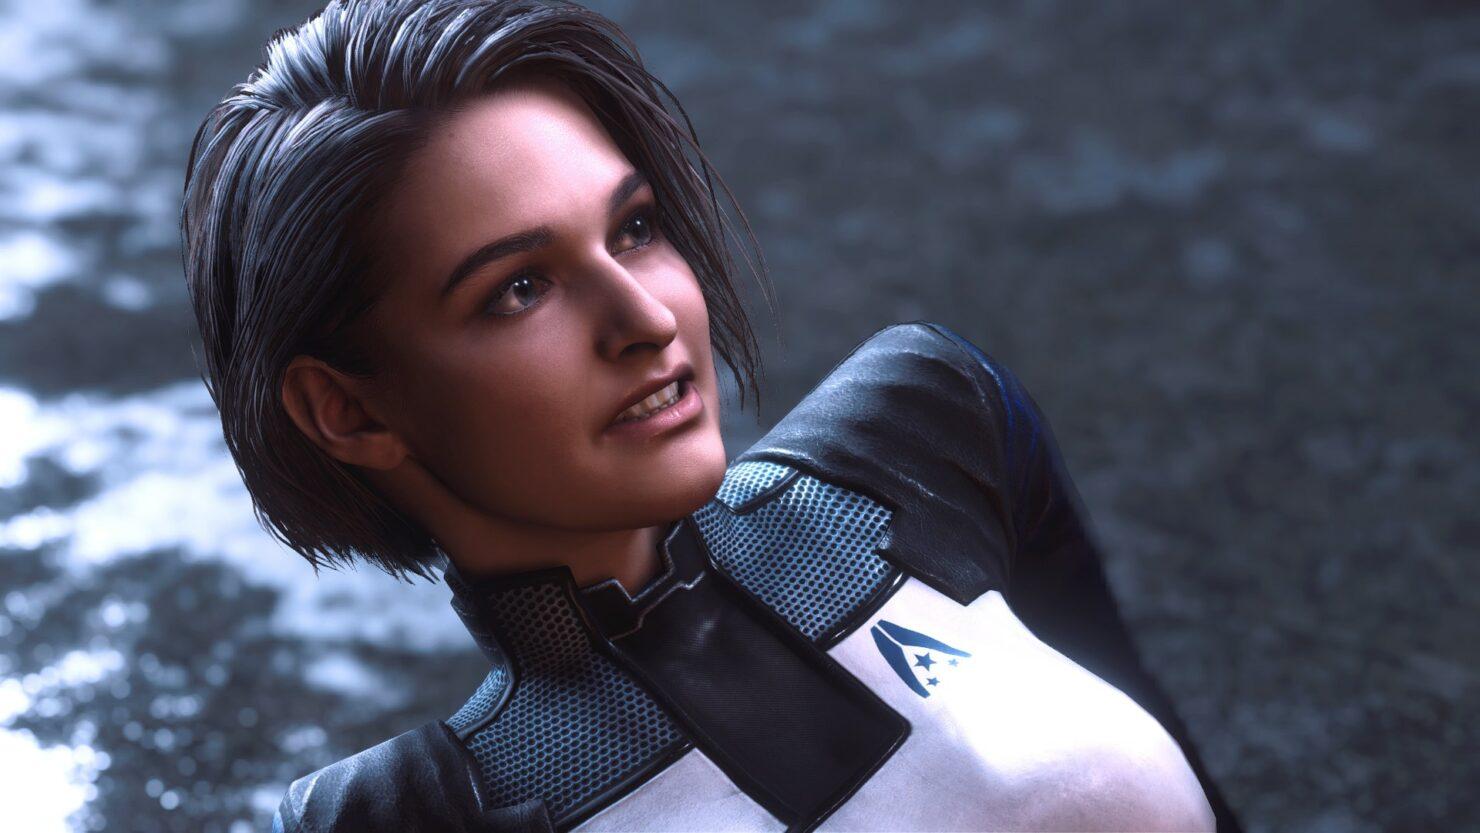 resident-evil-3-remake-edi-suit-mod-mass-effect-36